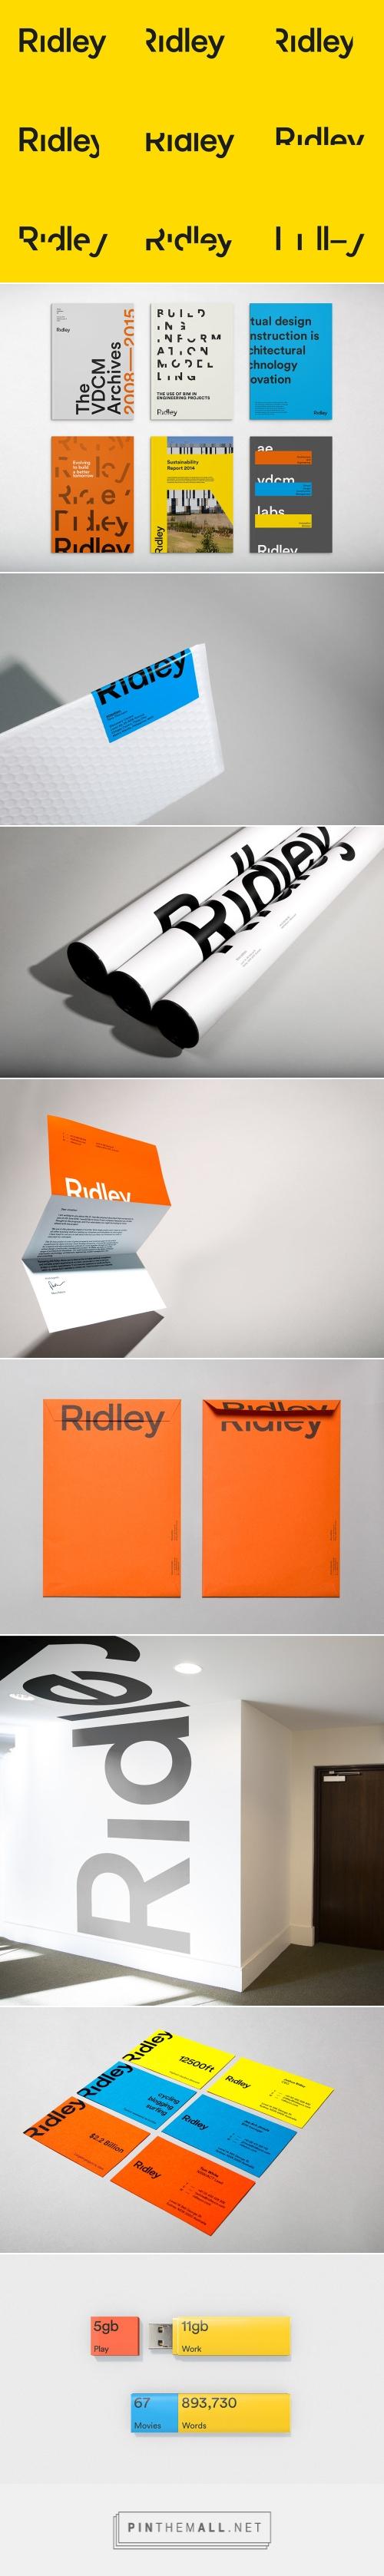 Ridley by Ryan Atkinson / Jason Little / RE: Sydney / Alex Creamer / Shannon Bell / Louise Elliott